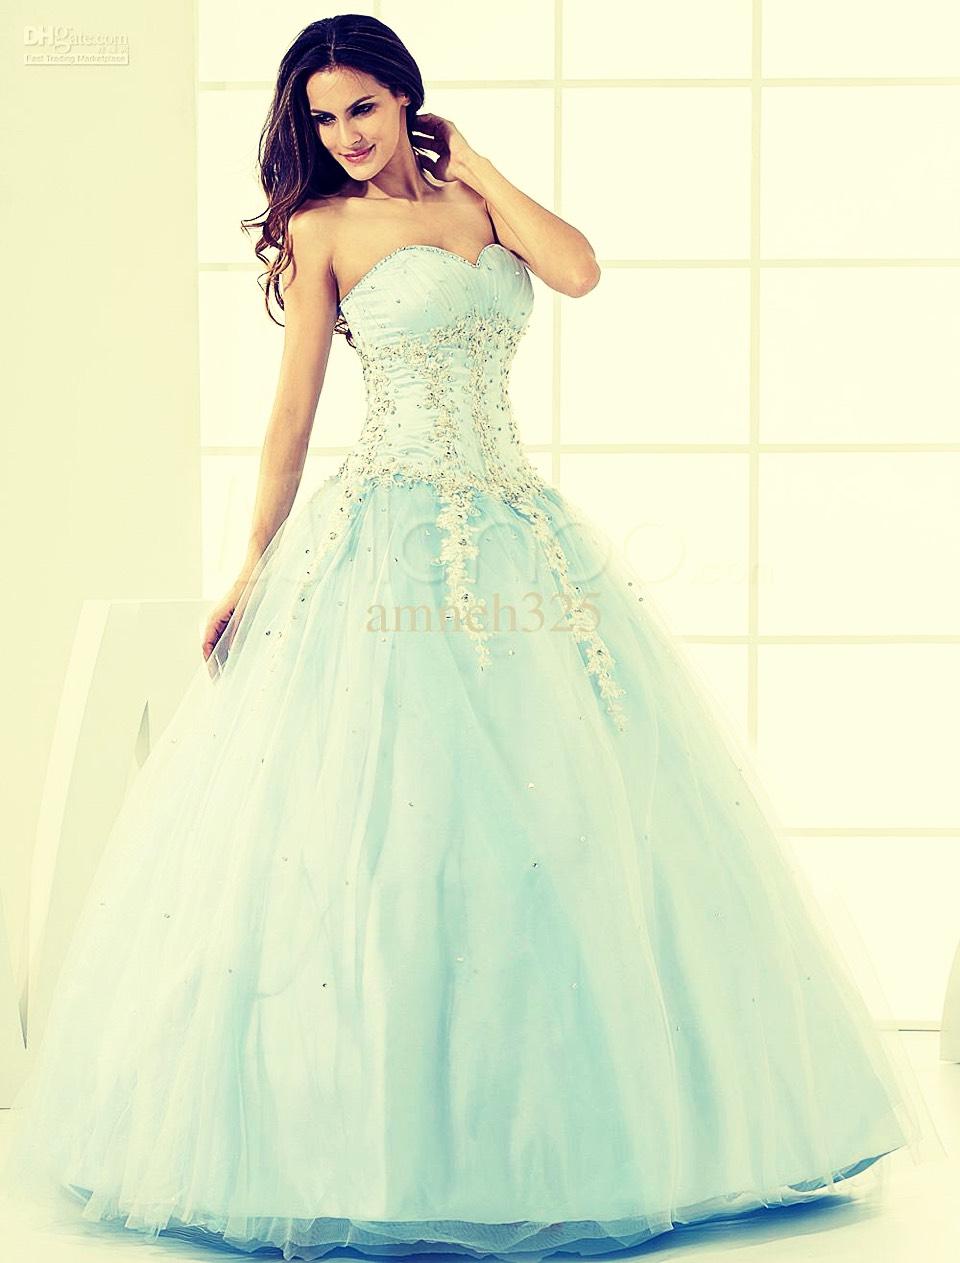 Winter prom dress💕